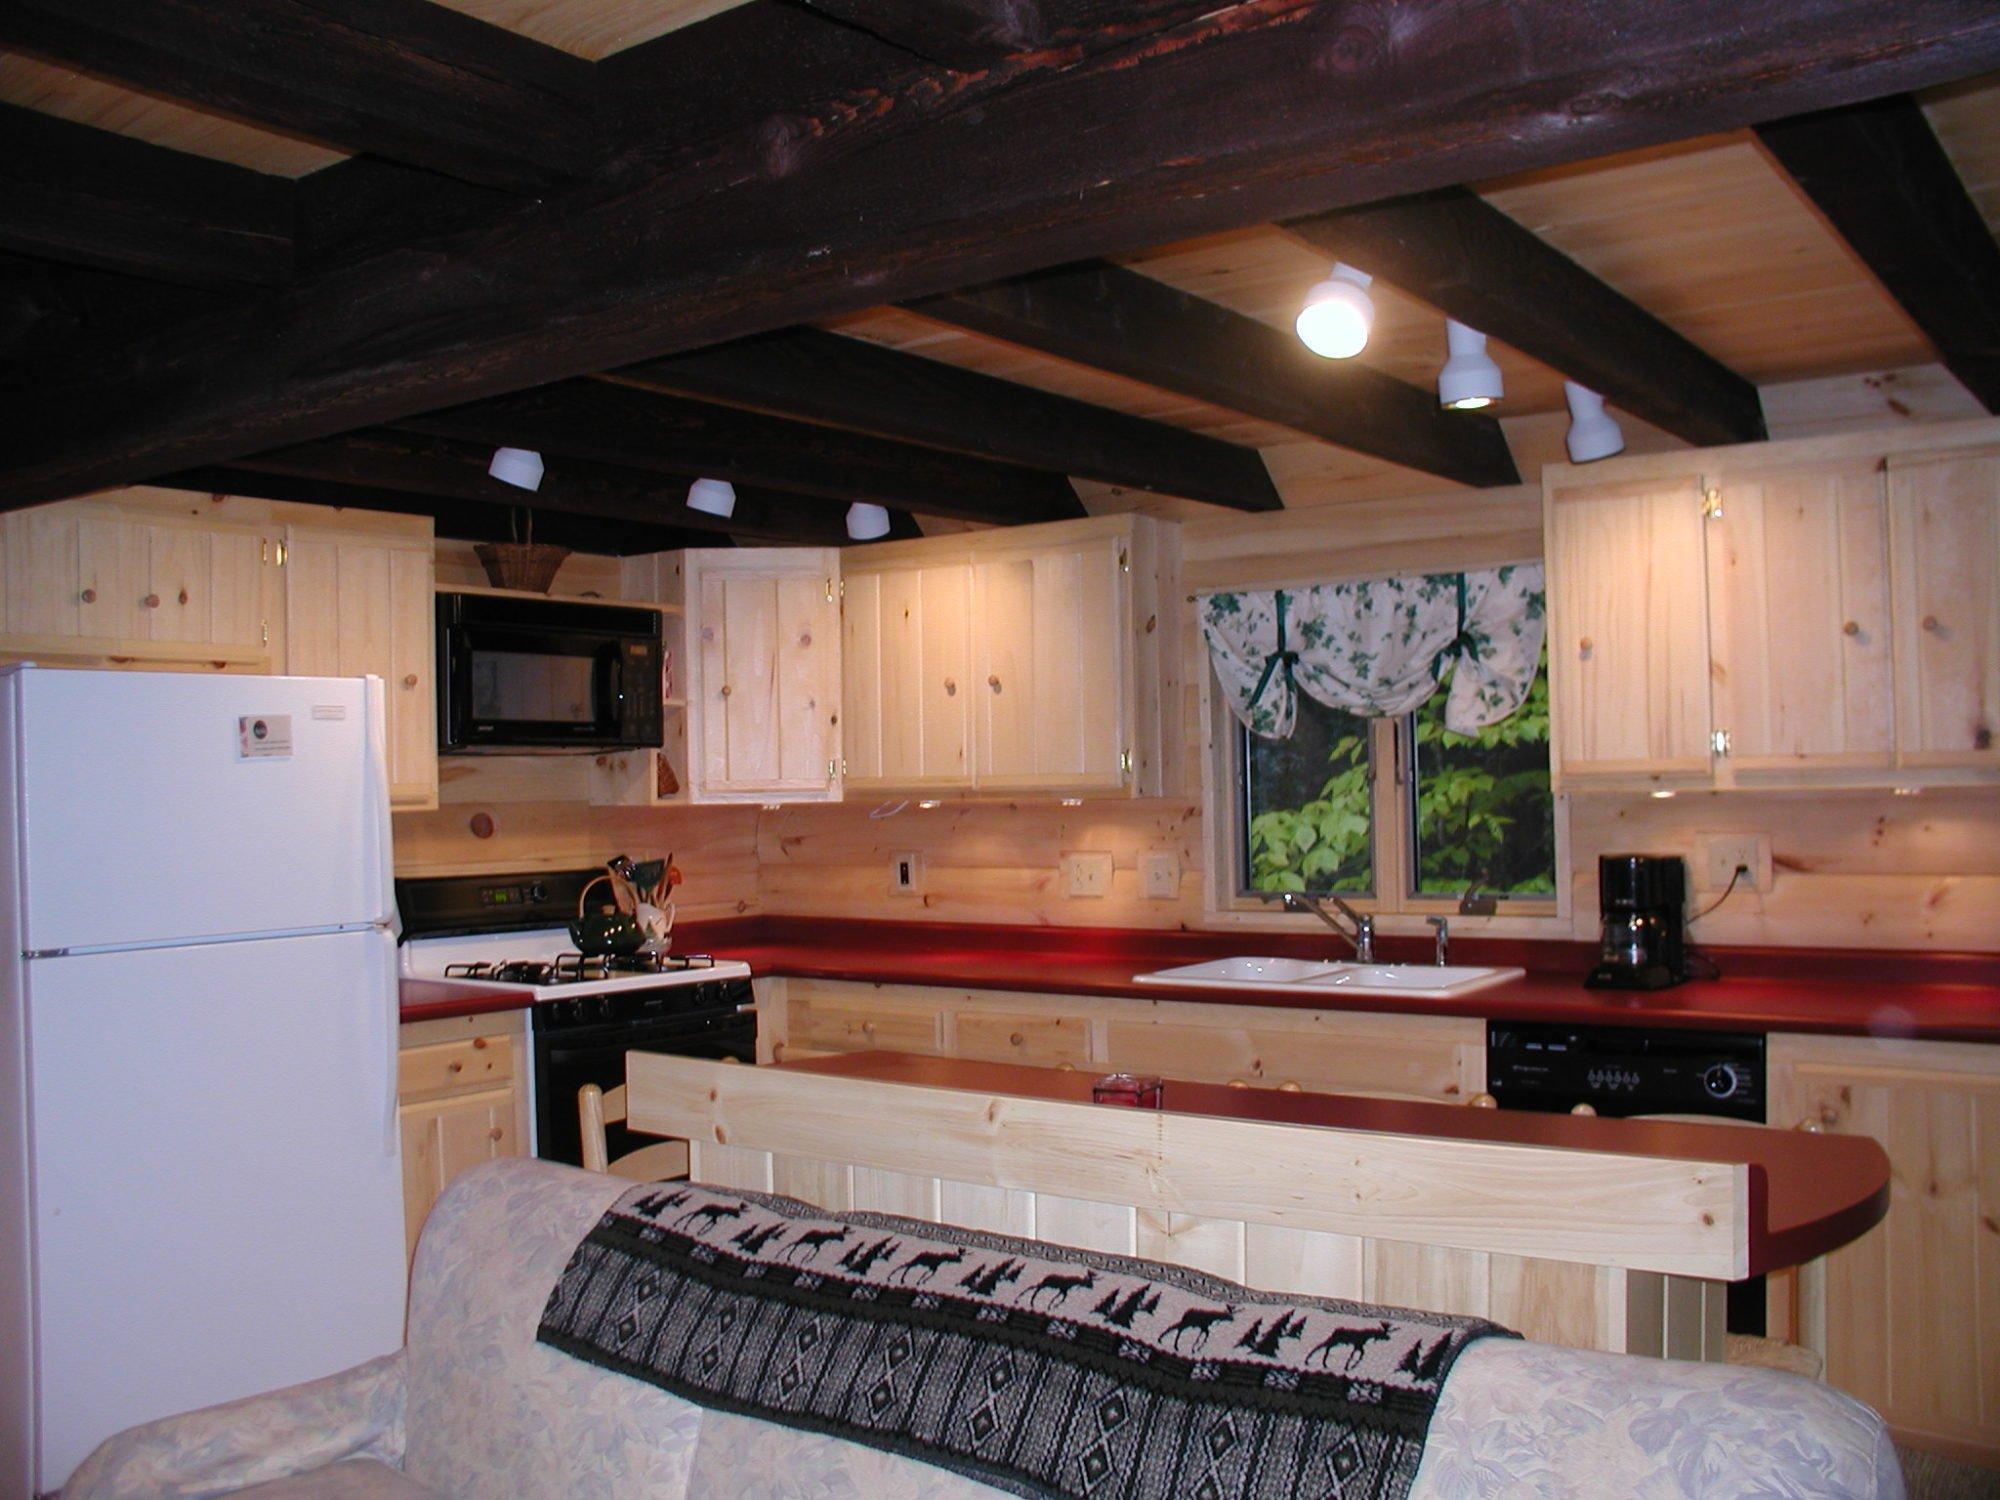 Moosehead Hills Cabins Rustic Luxury Log Cabin Rentals